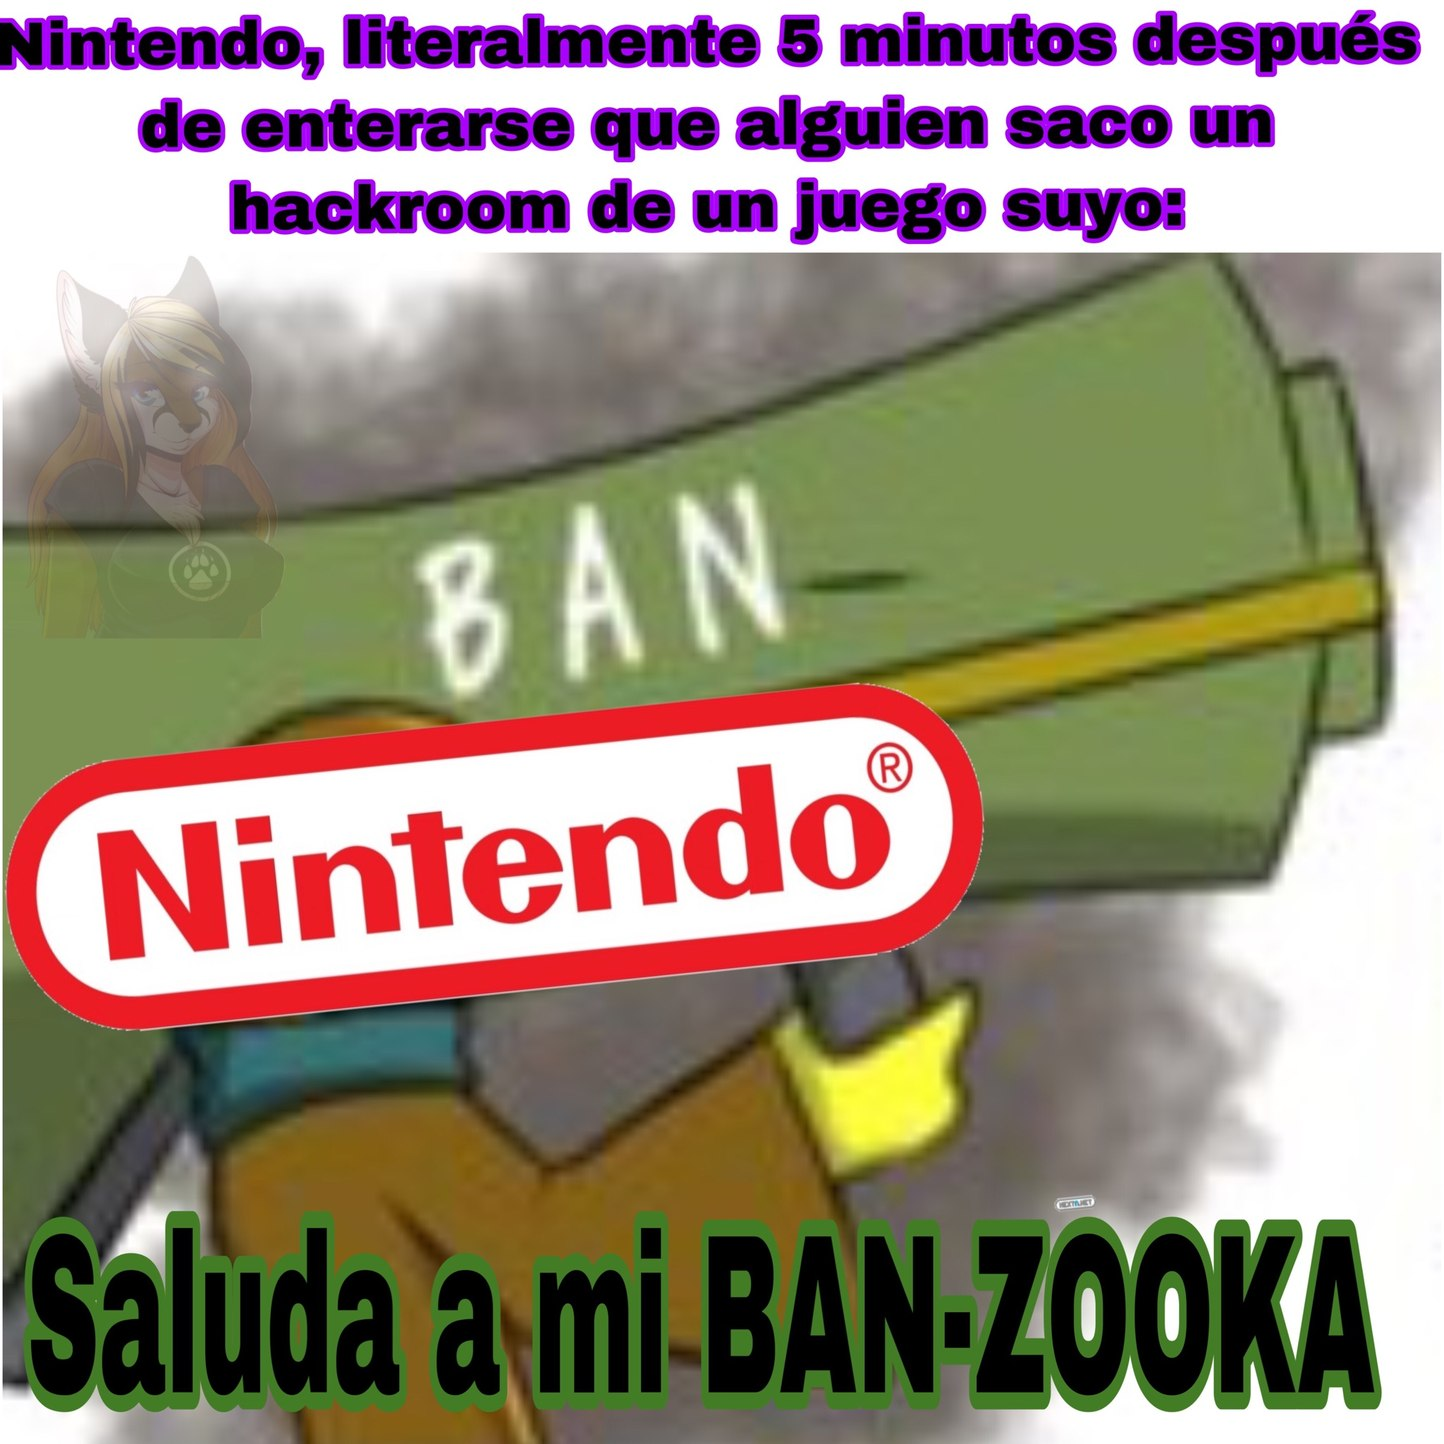 entendieron? ban-zooka....ban....zooka.....ok ya paro - meme